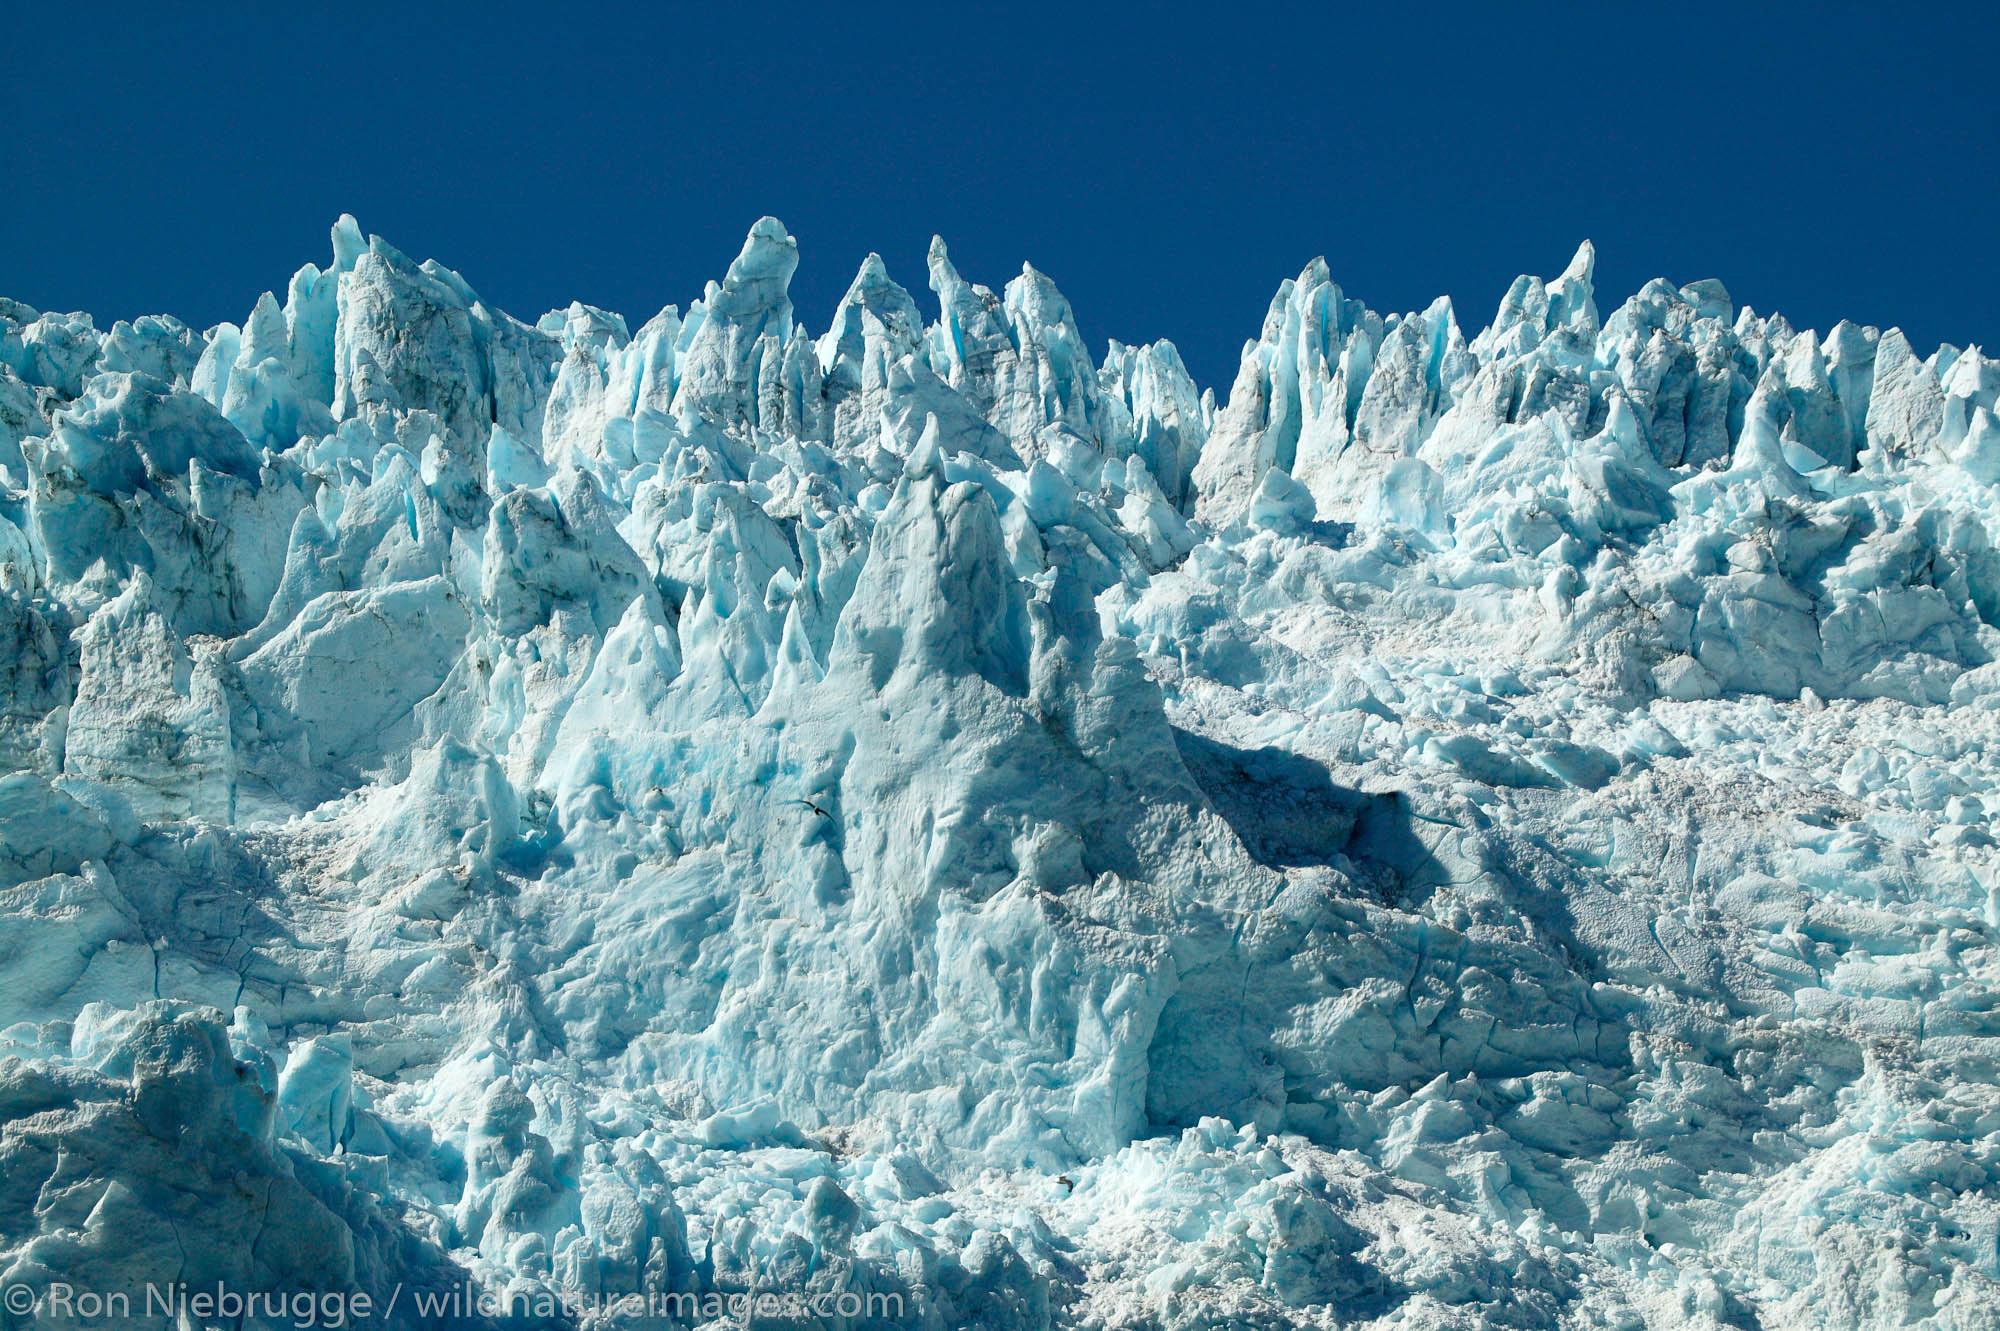 Seracs on Holgate Glacier, Aialik Bay, Kenai Fjords National Park, near Seward, Alaska.